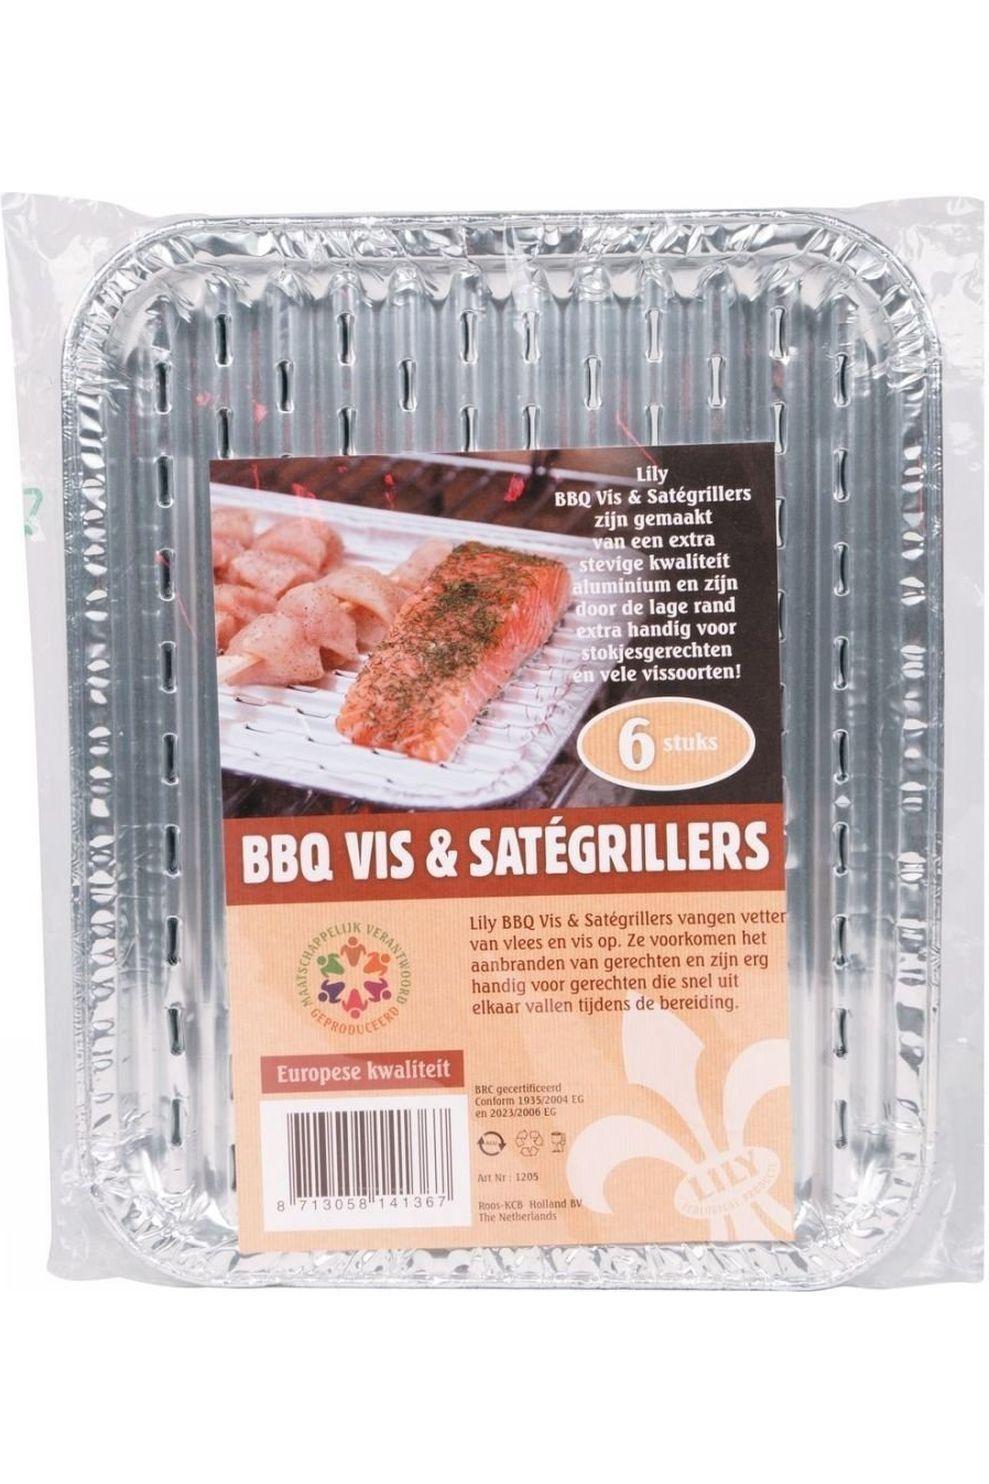 Lily Kookvuur Barbecue Vis & Satégrillers 6 Stuks - Grijs